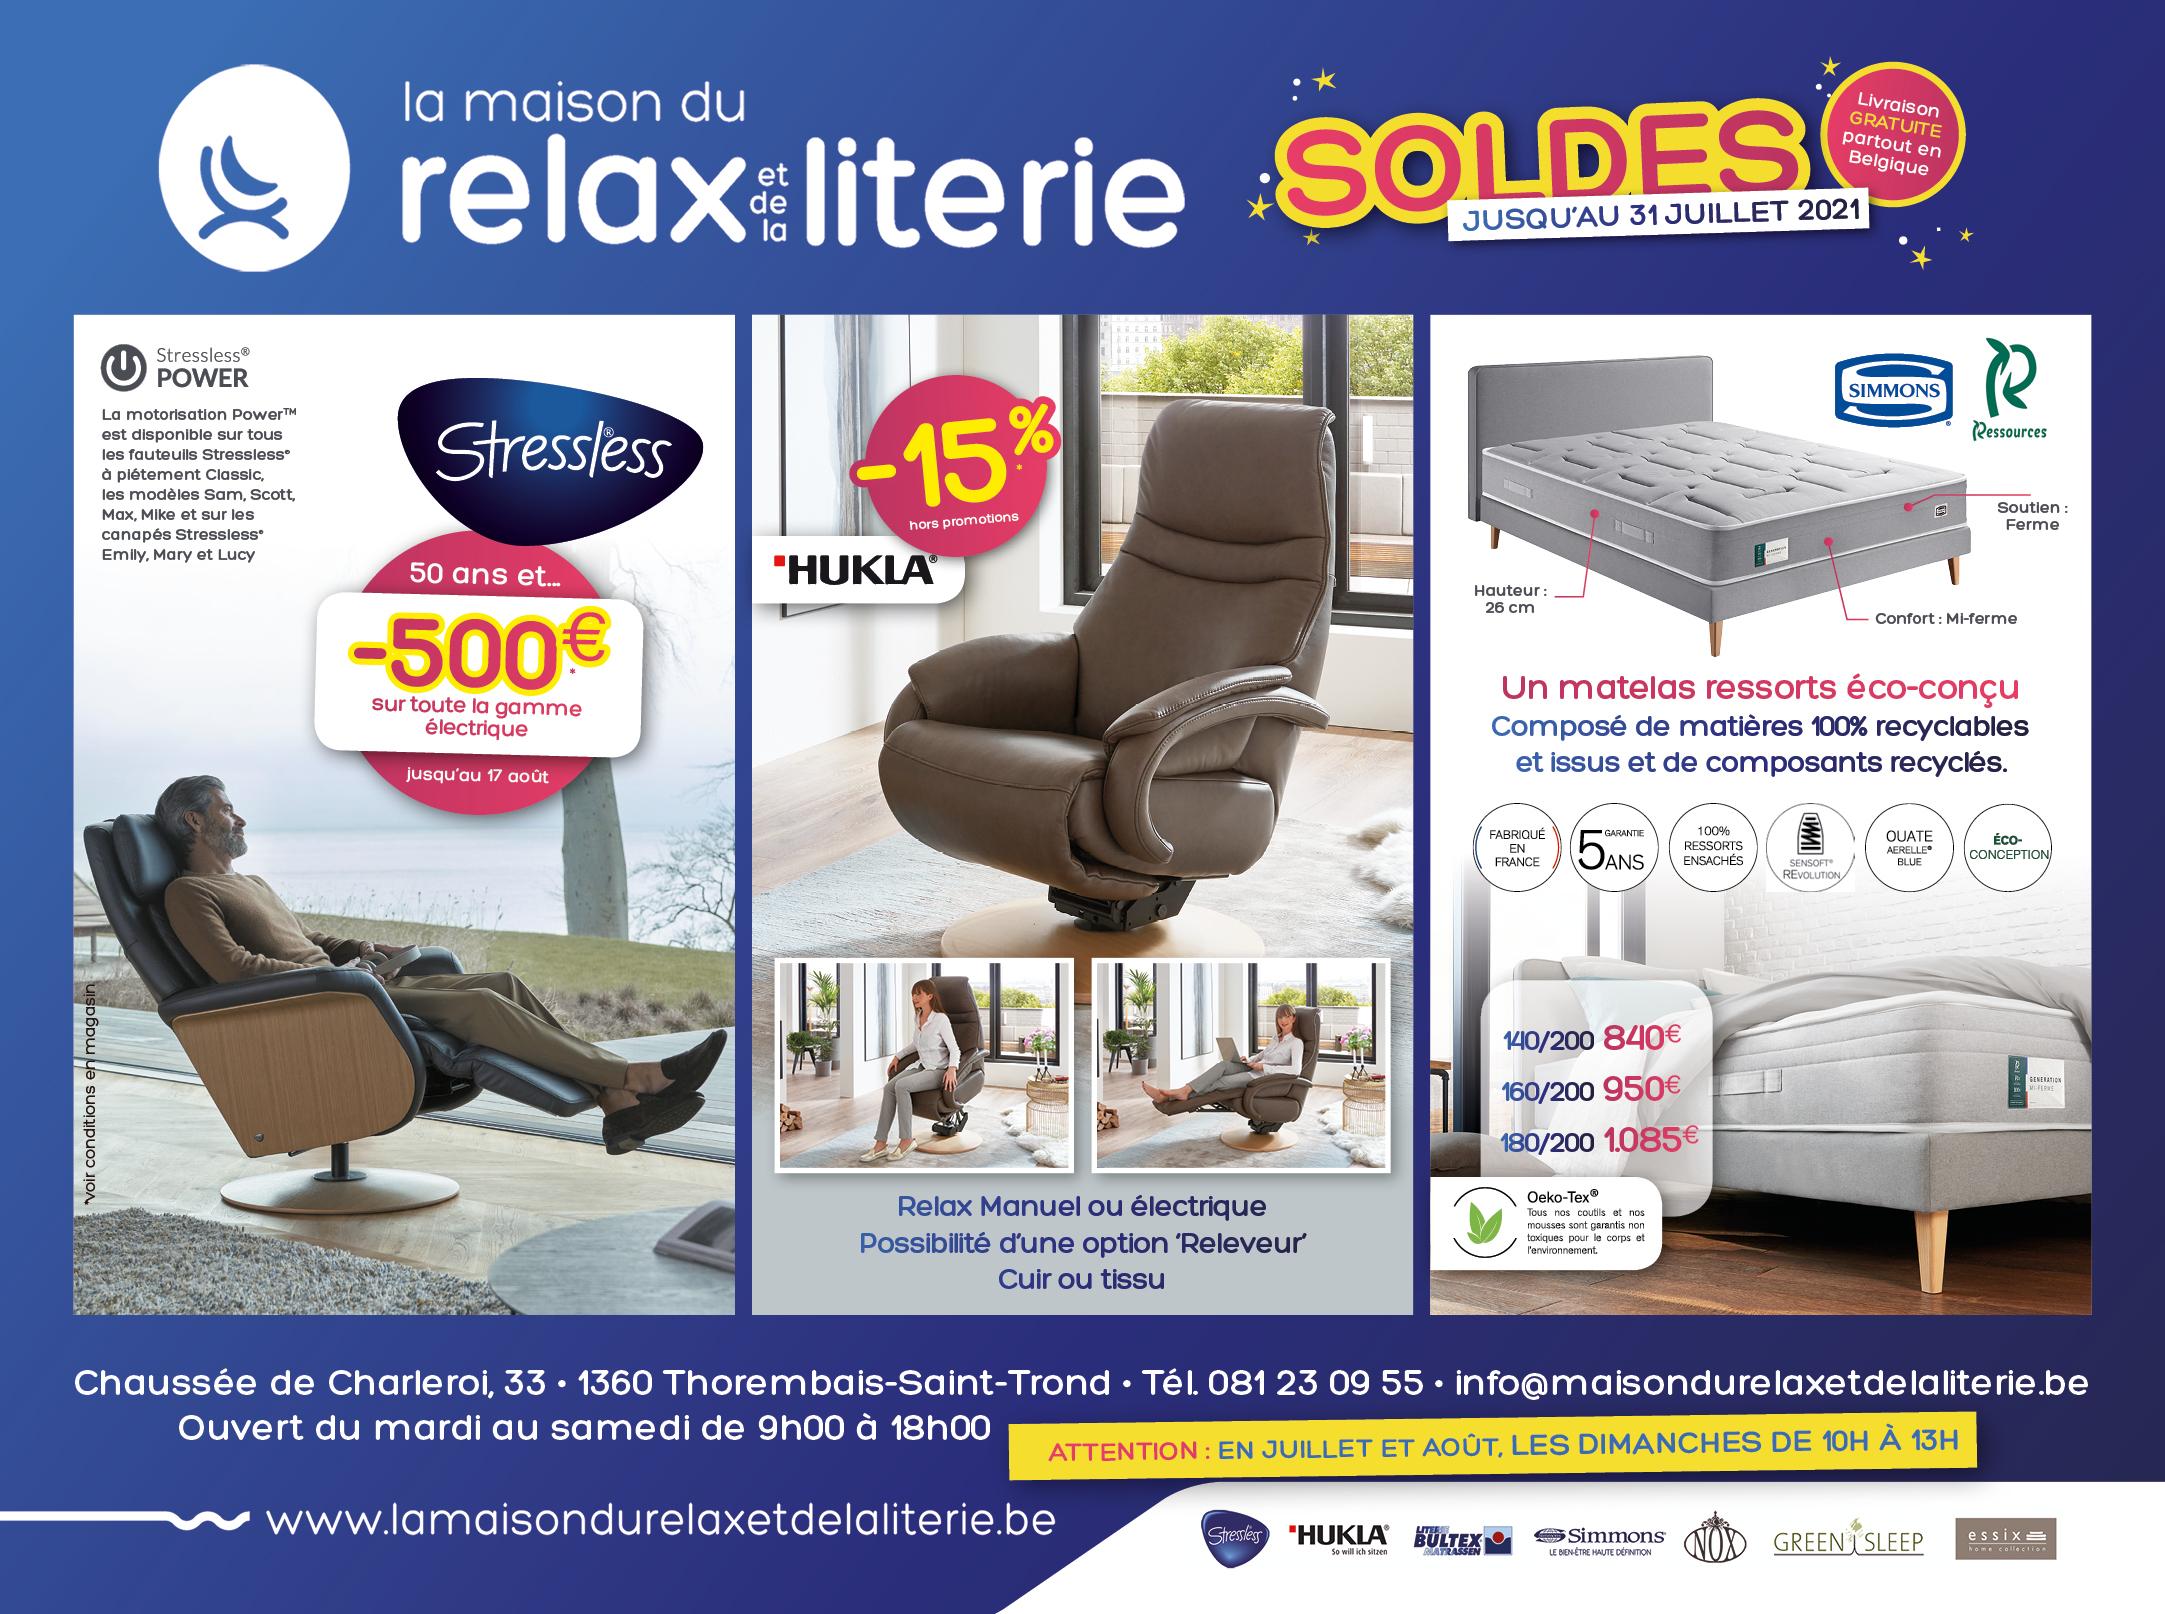 relaxliterie359+242_0707_12mod_soldes-1